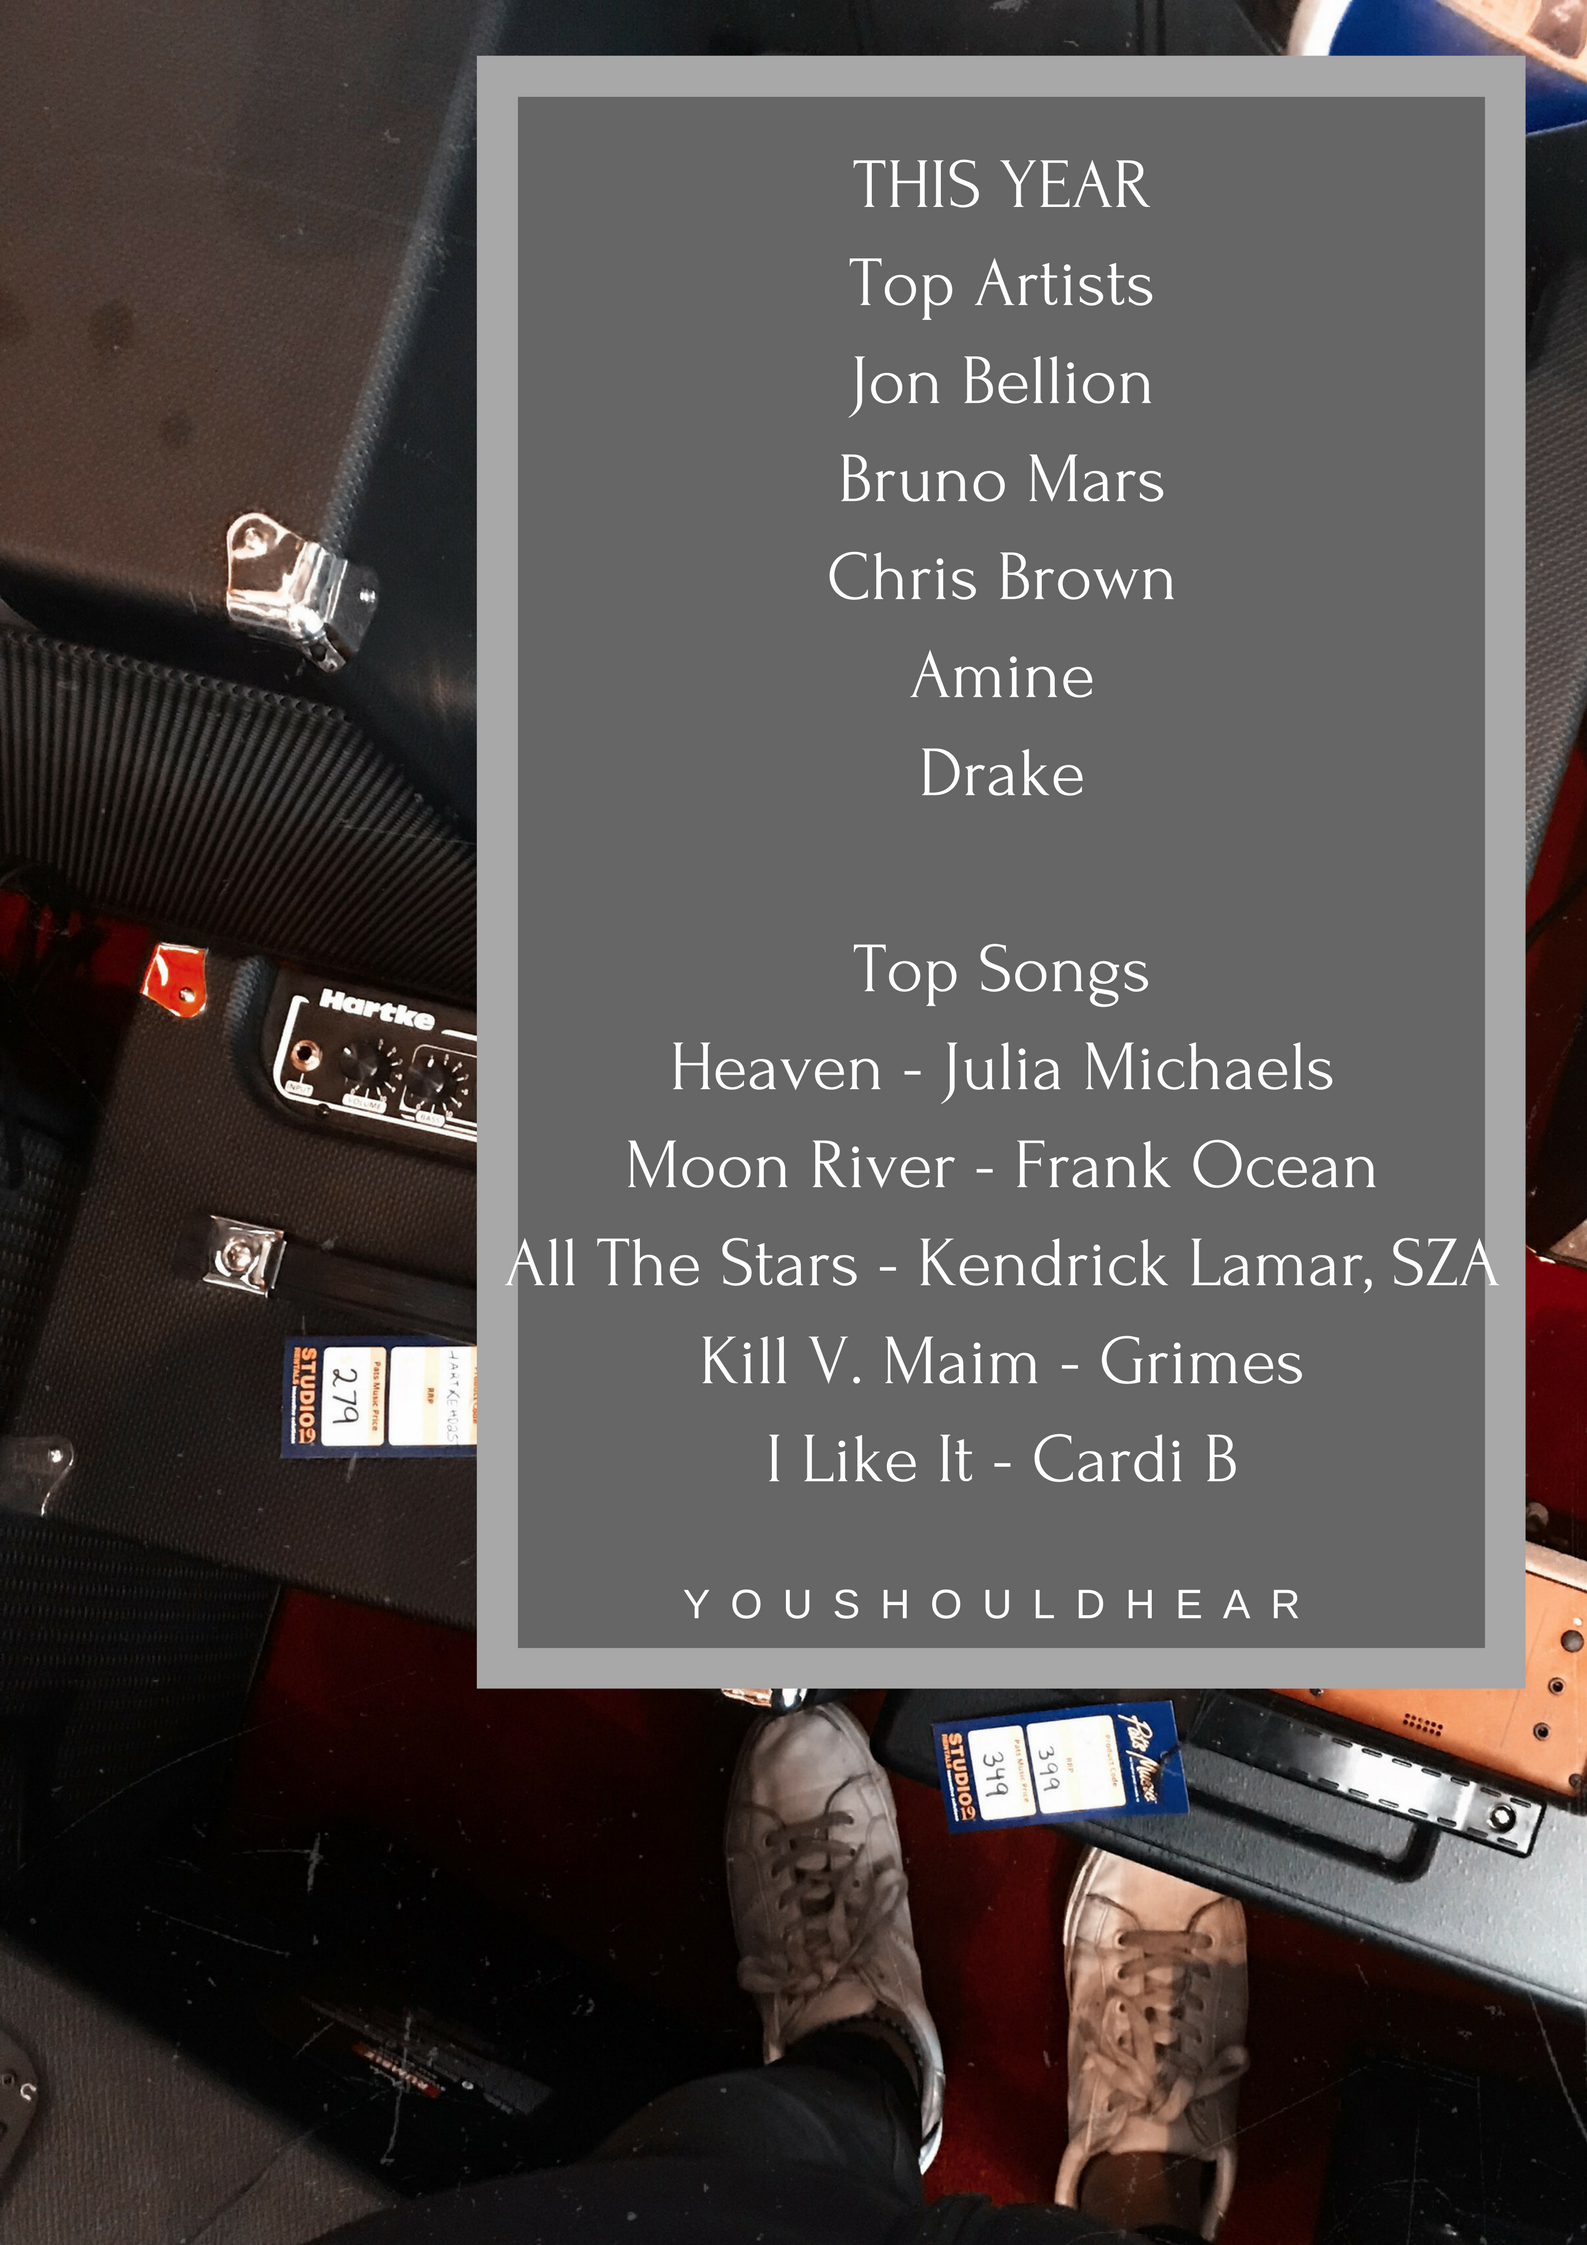 THIS YEARTop ArtistsJon BellionBruno MarsChris BrownAmineDrakeTop SongsHeaven - Julia MichaelsMoon River - Frank OceanAll The Stars - Kendrick Lamar, SZAKill V. Maim - GrimesI Like It -